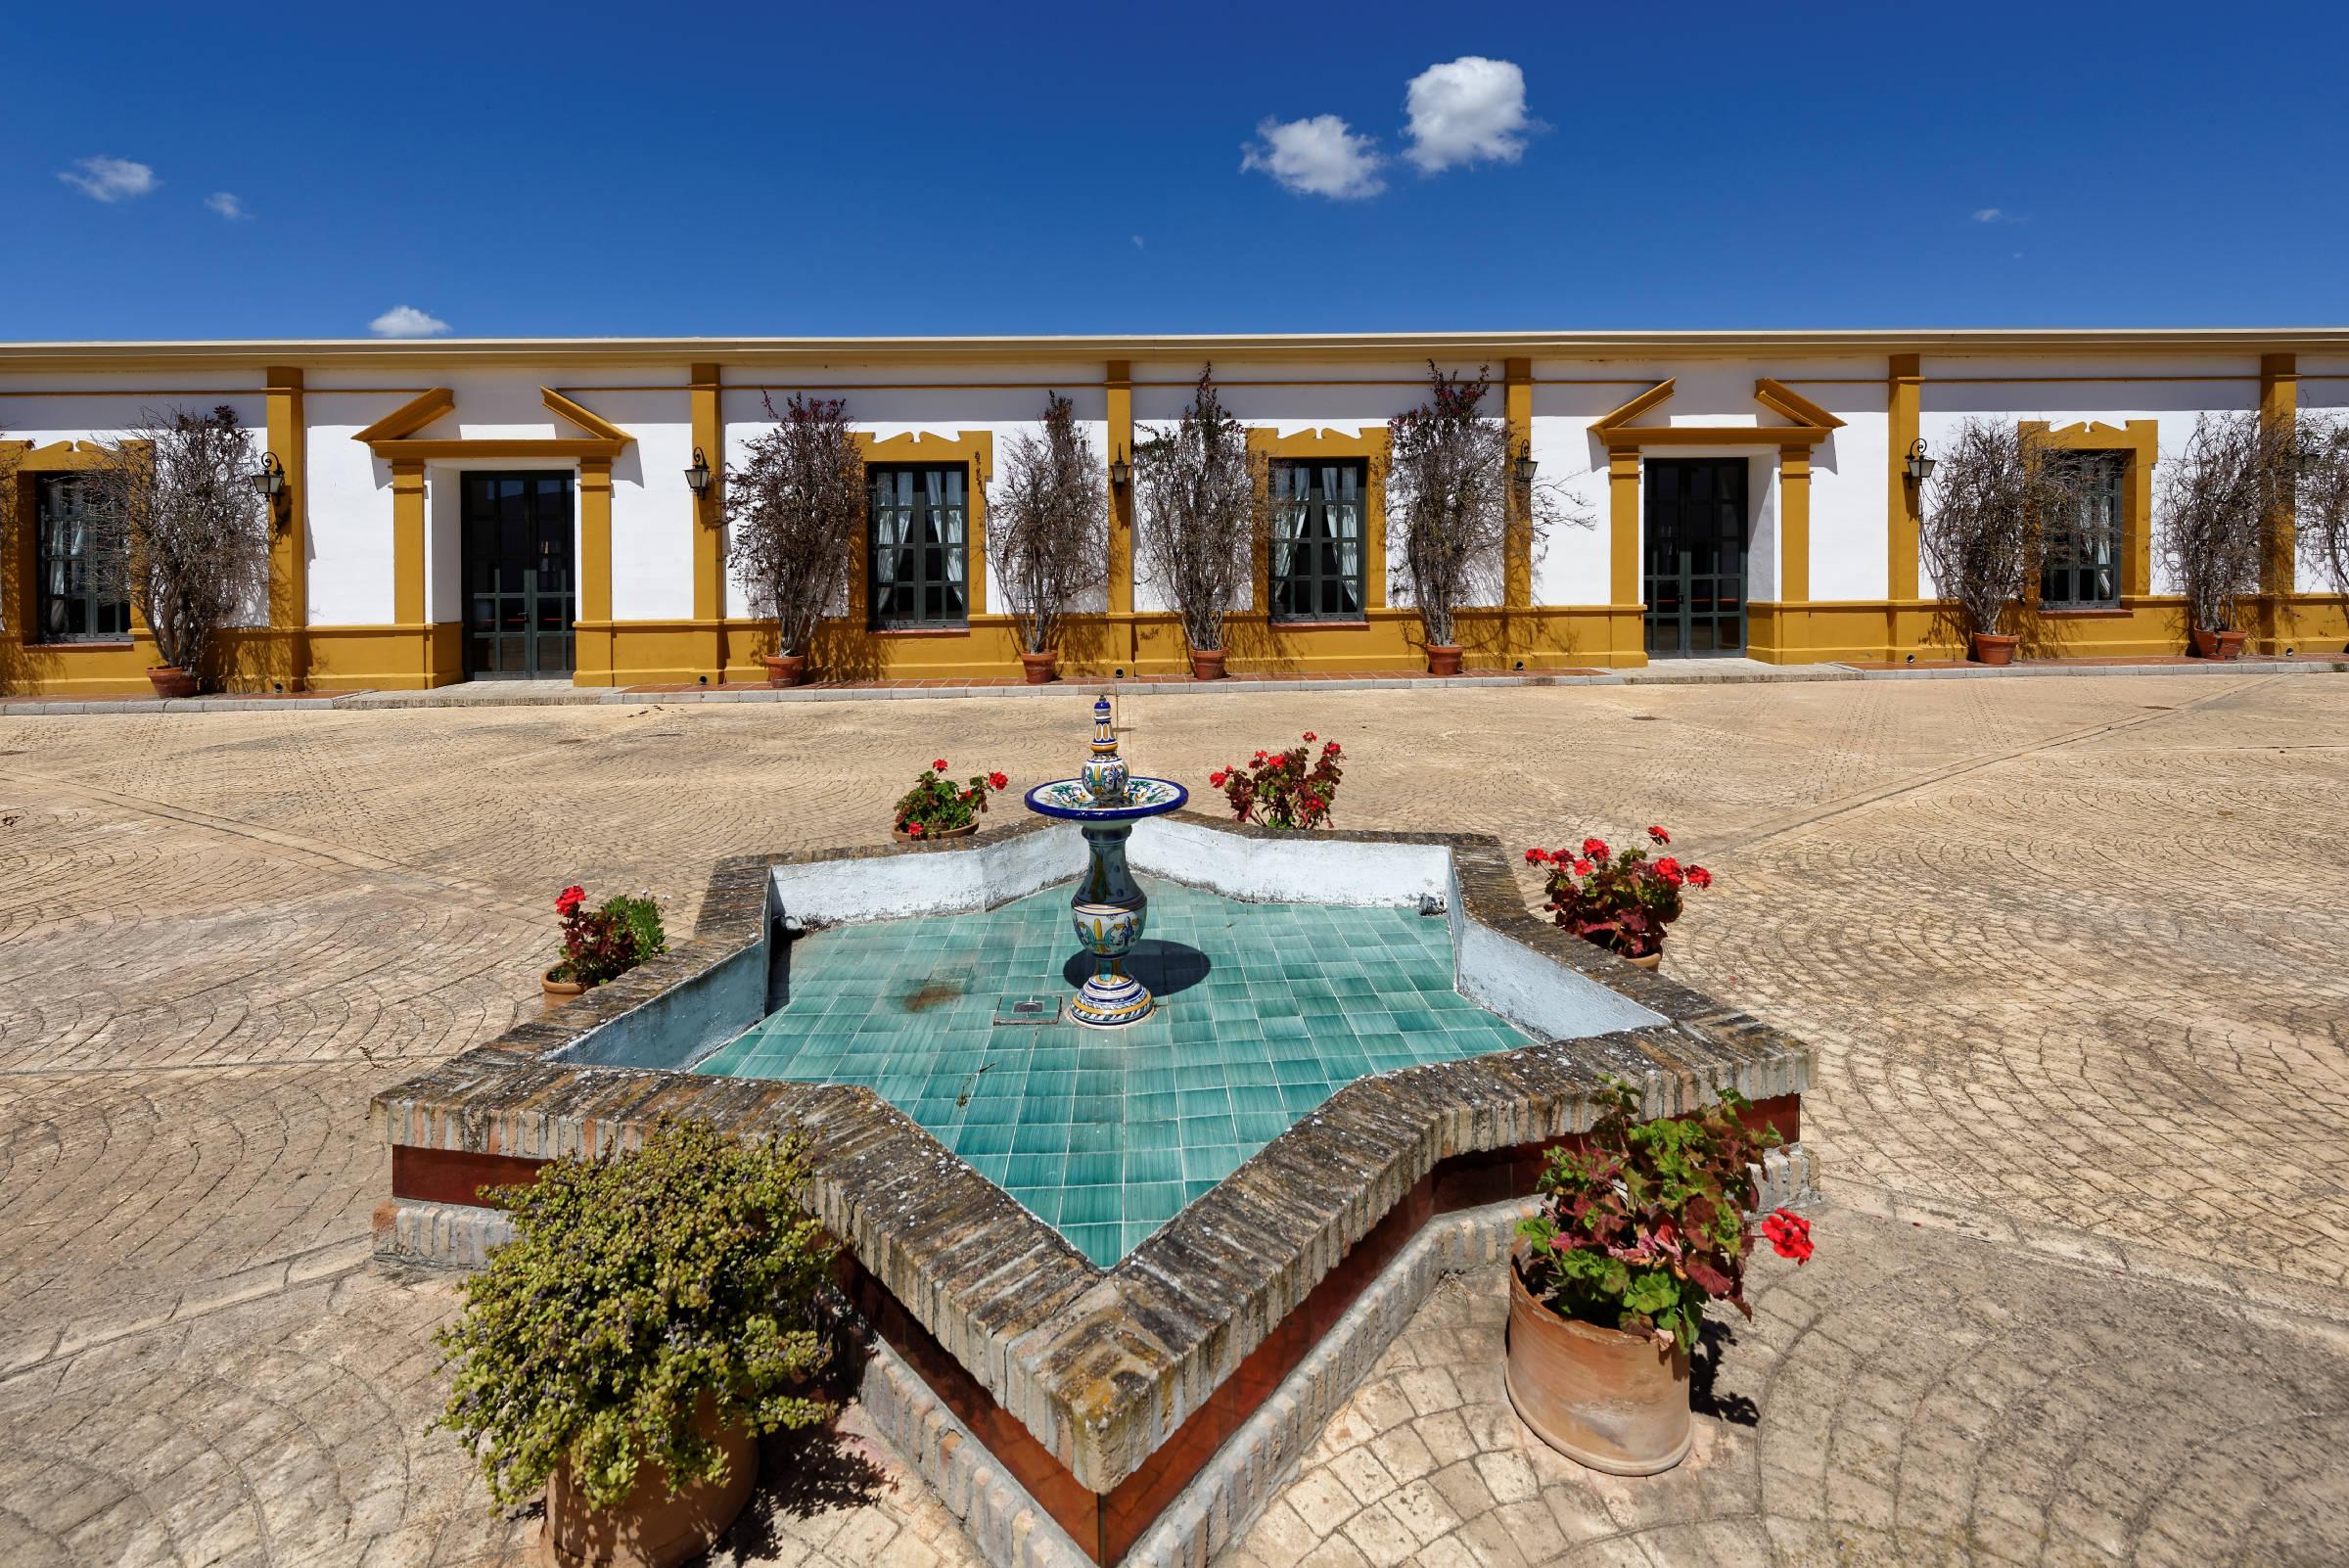 160414-Isla minima - Escobar (Andalousie) (45)